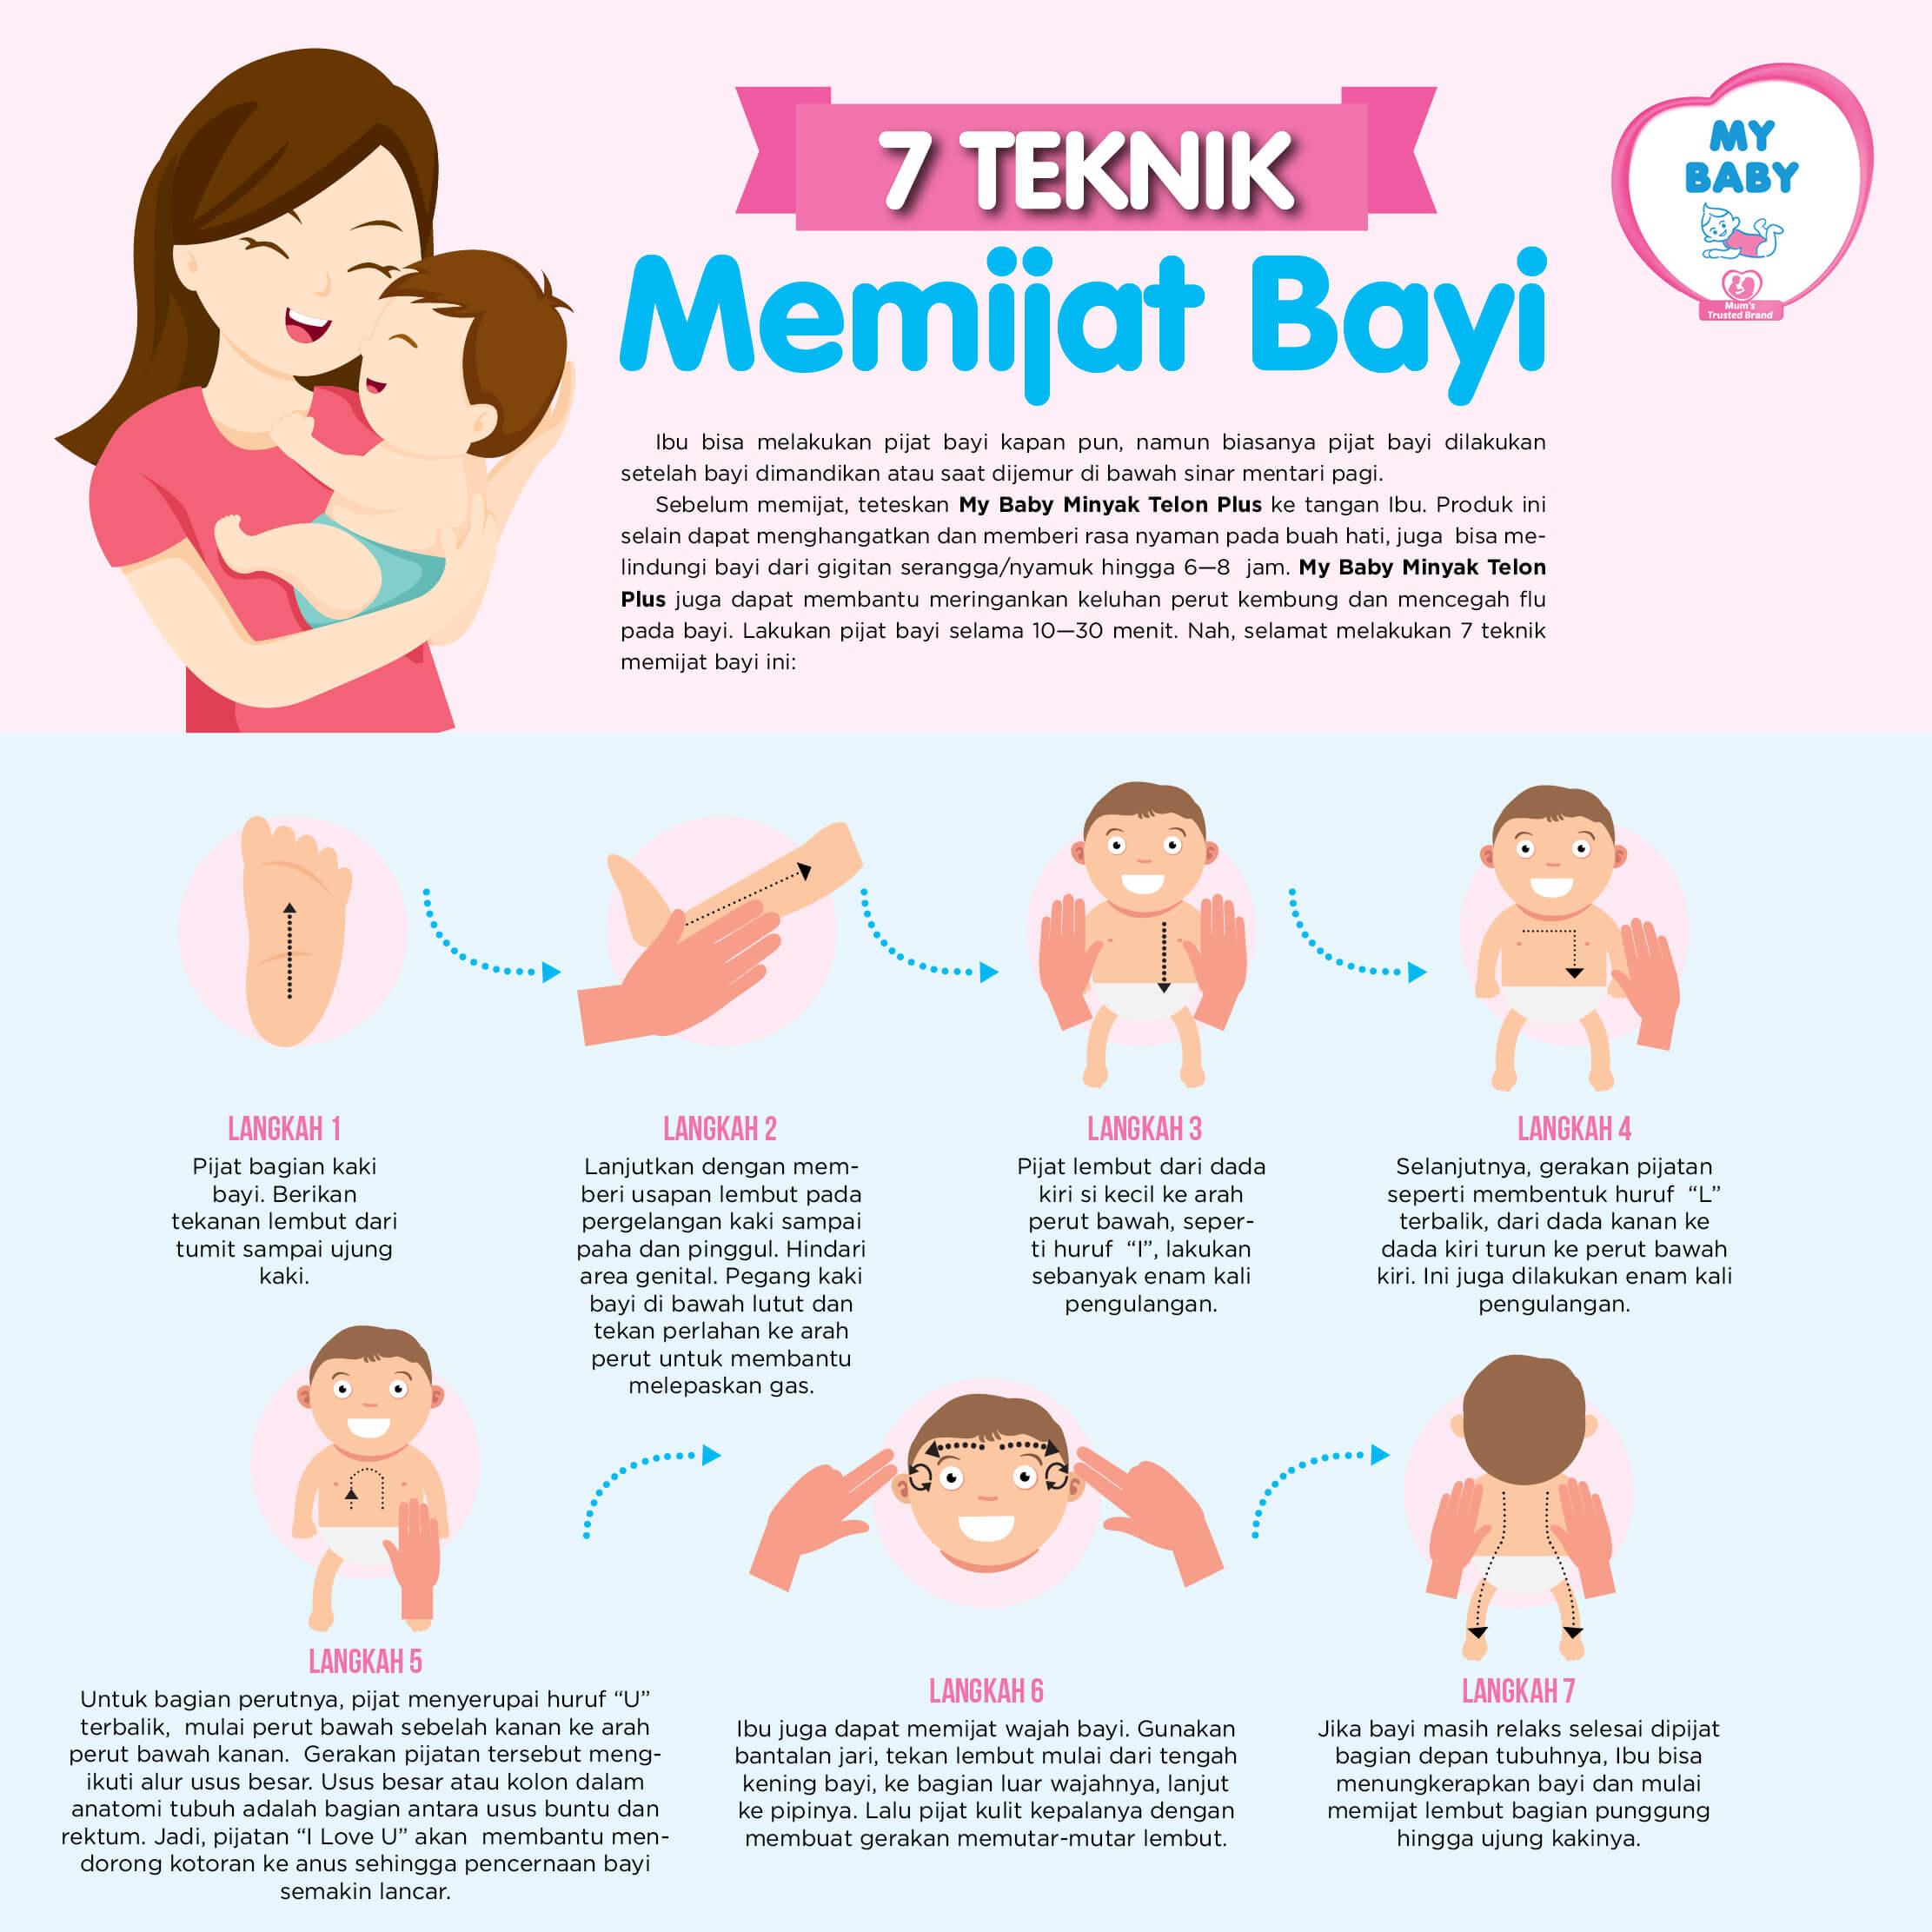 7 Teknik Memijat Bayi